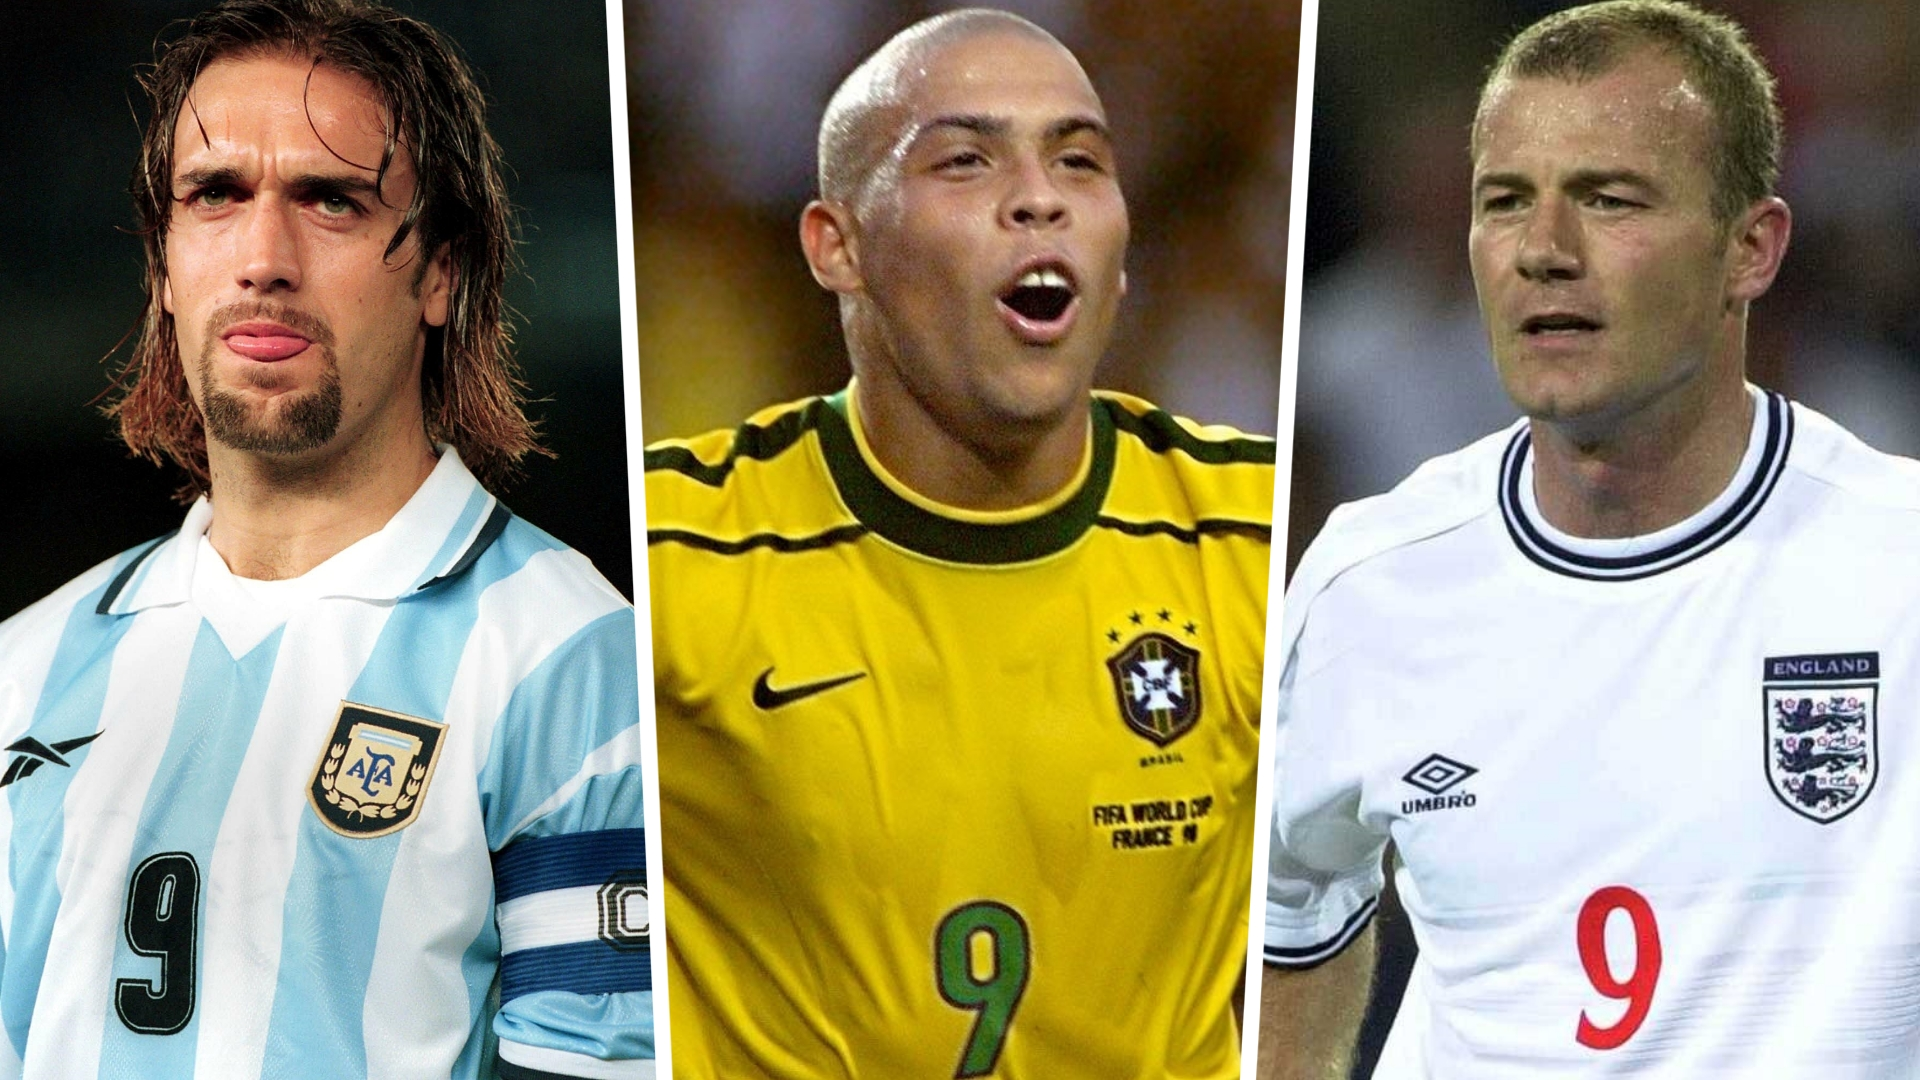 Ronaldo, Batistuta & the all-time best 'Number 9' strikers in football